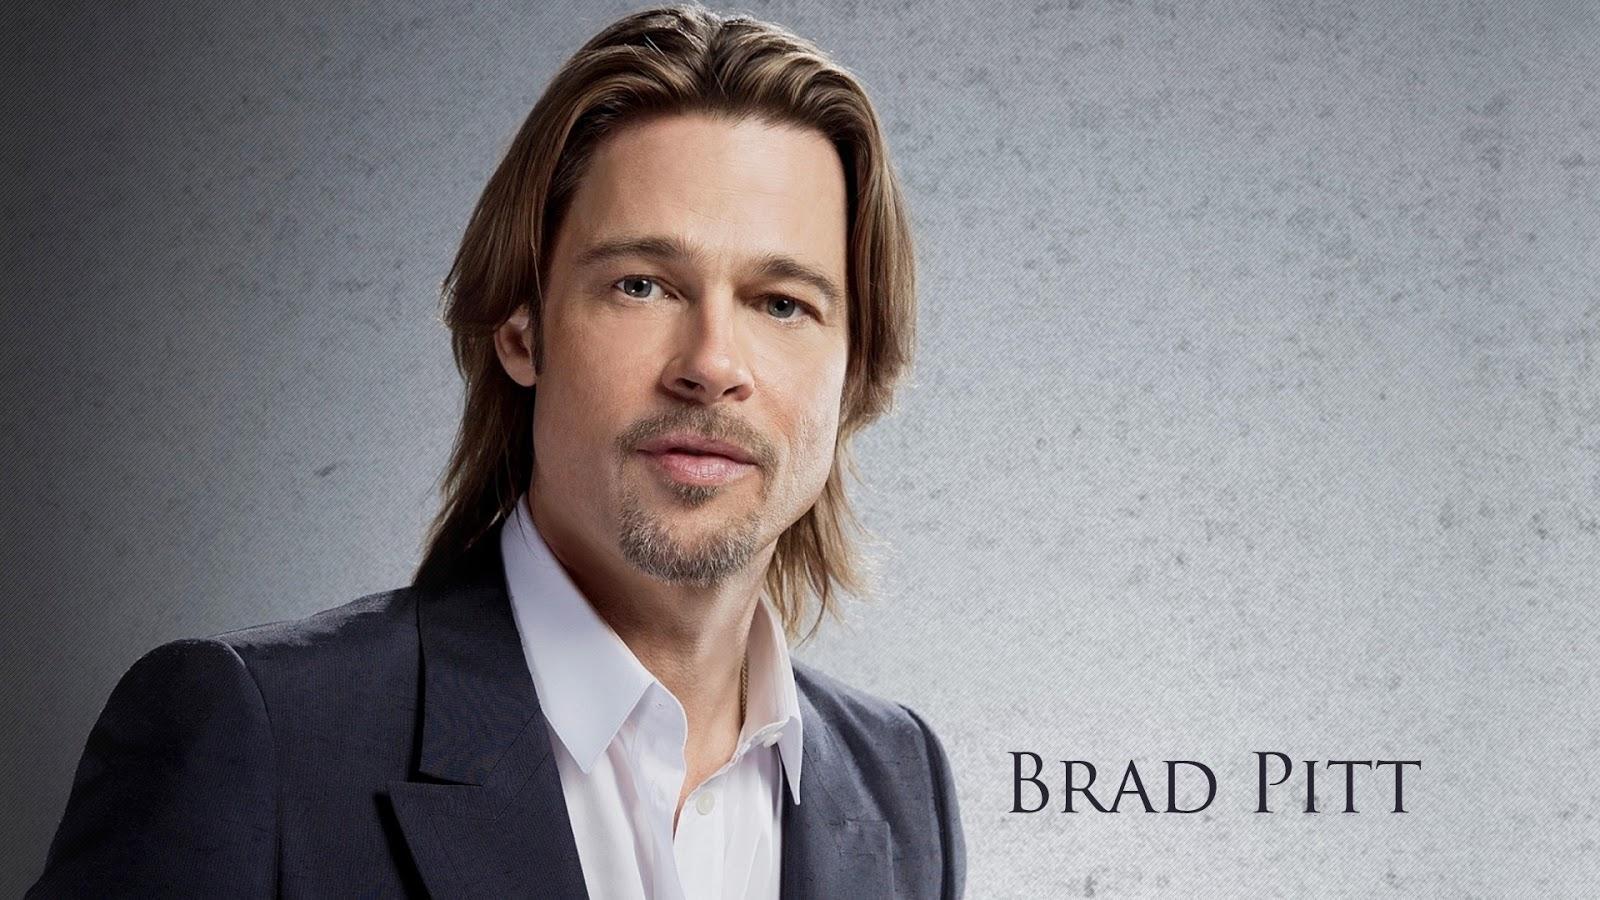 Brad Pitt Hd Wallpapers: All Categories: Brad Pitt New HD